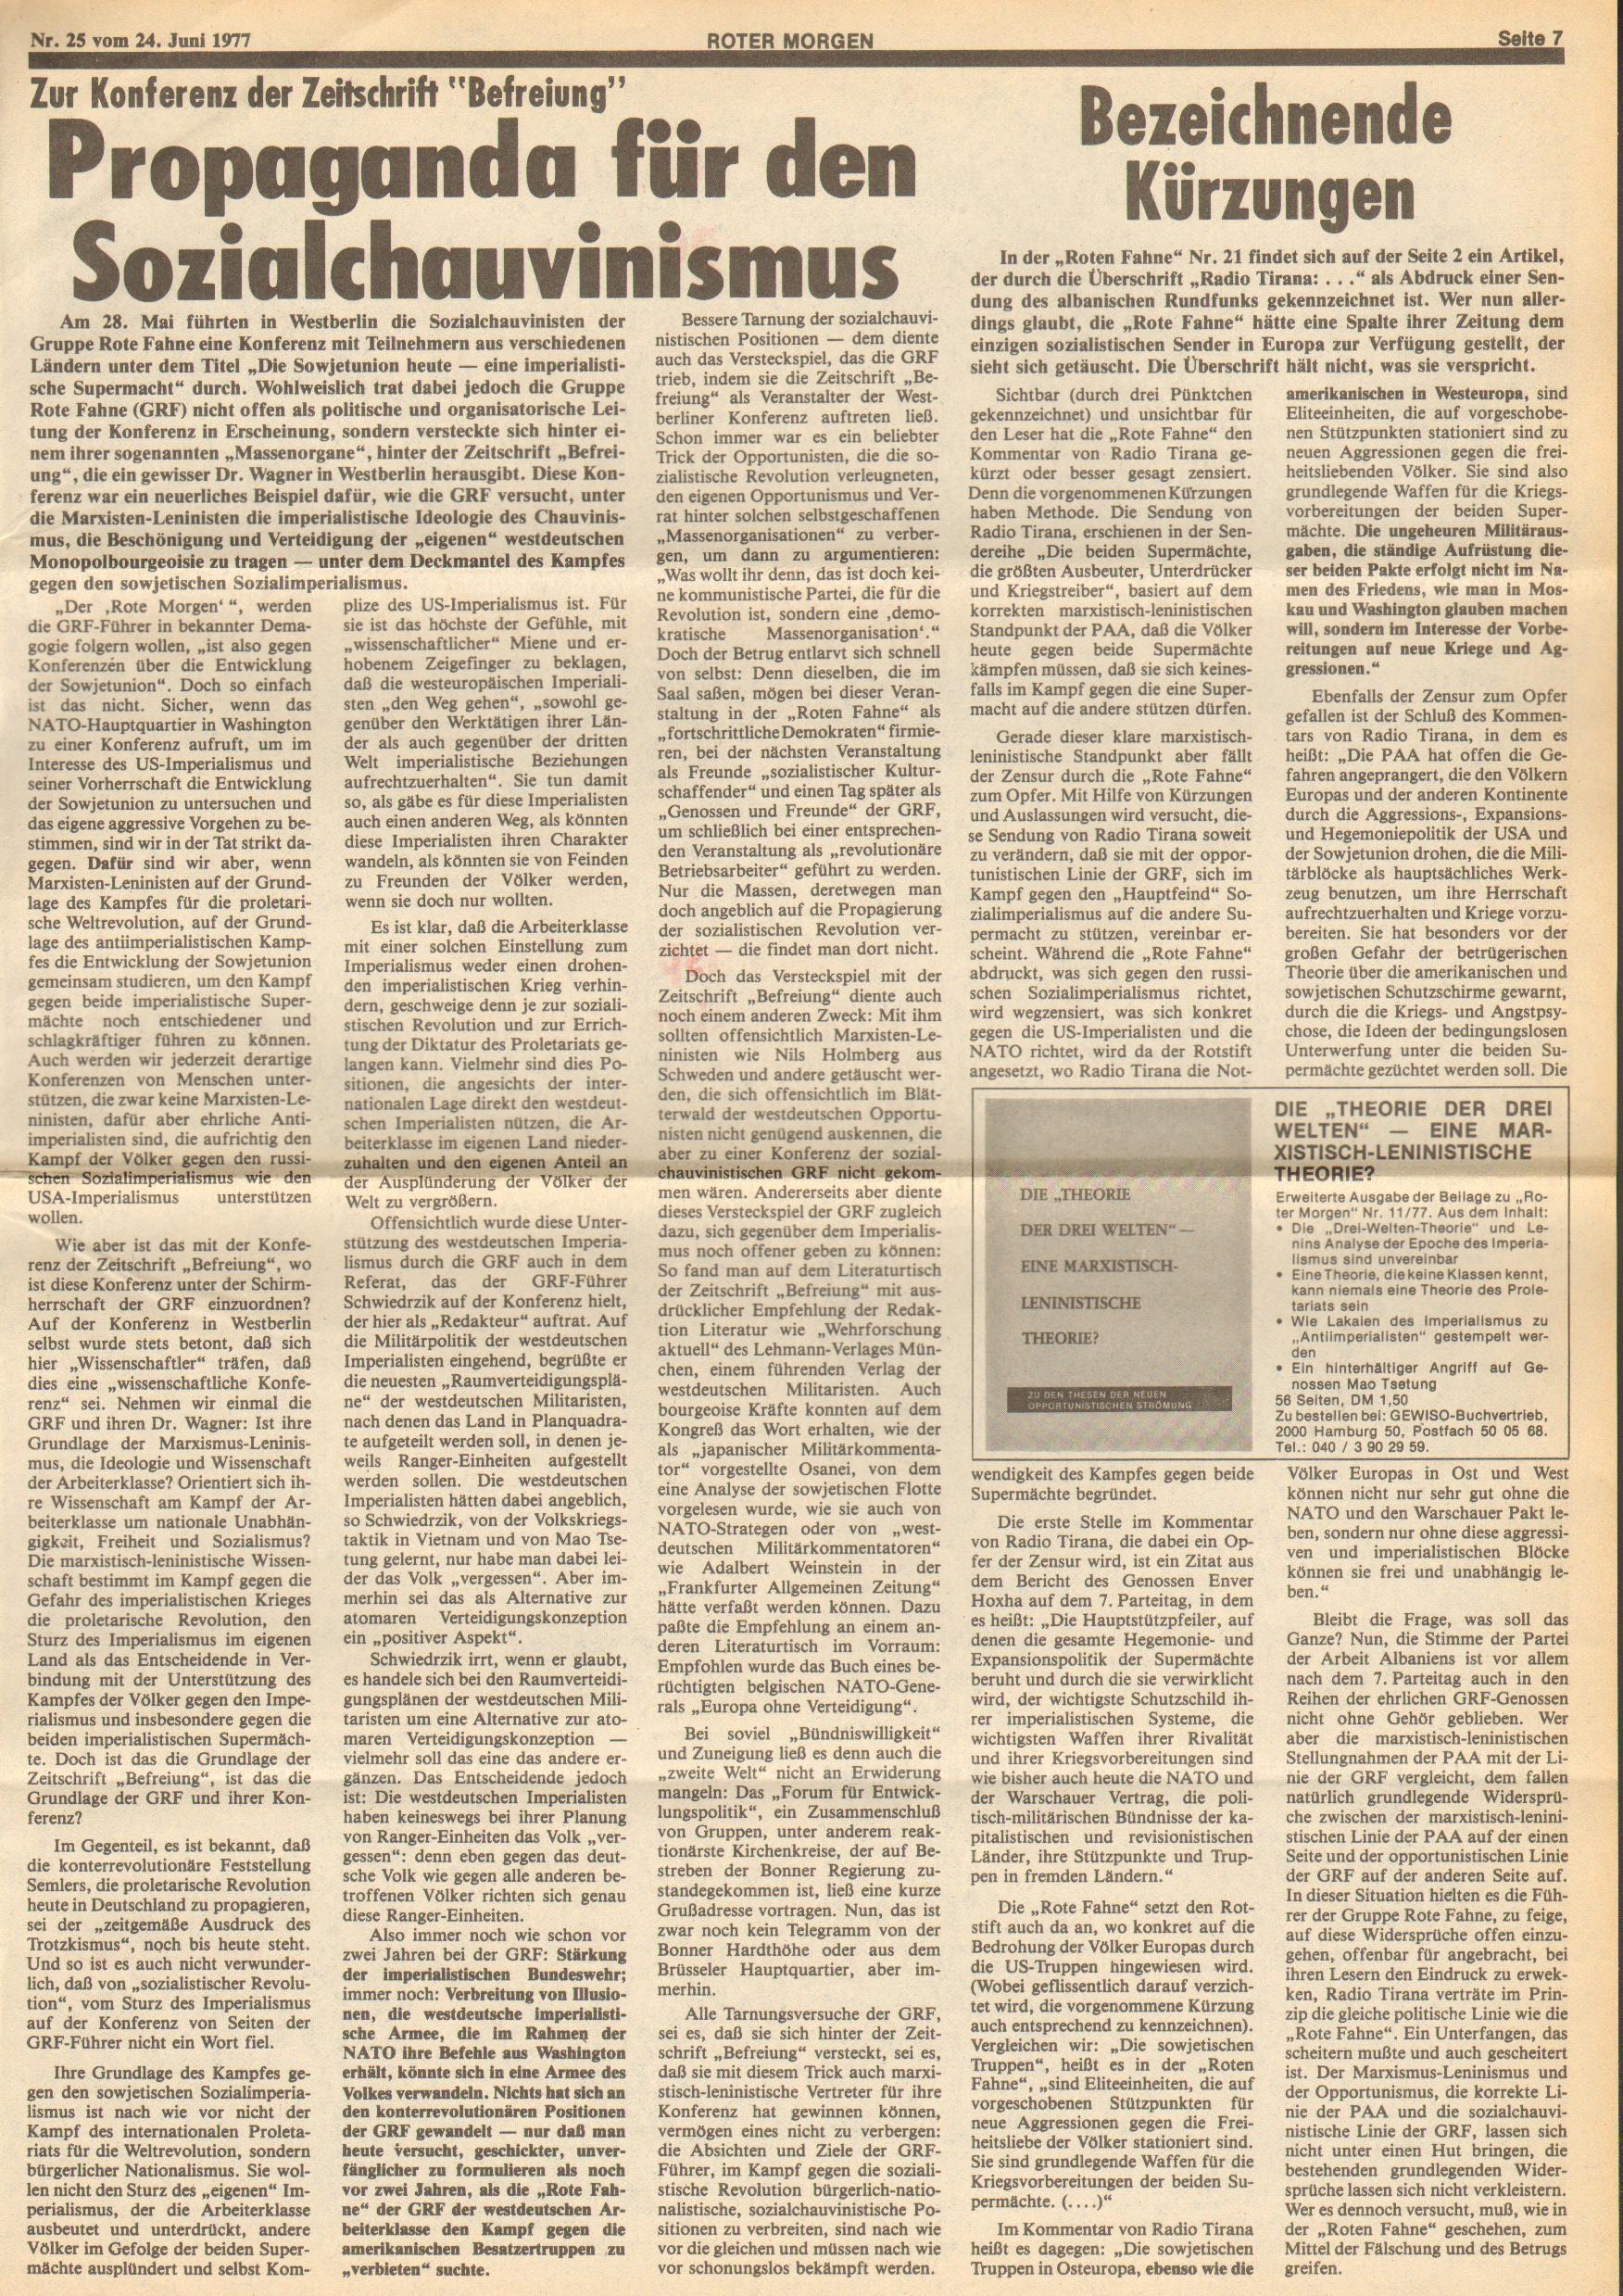 Roter Morgen, 11. Jg., 24. Juni 1977, Nr. 25, Seite 7